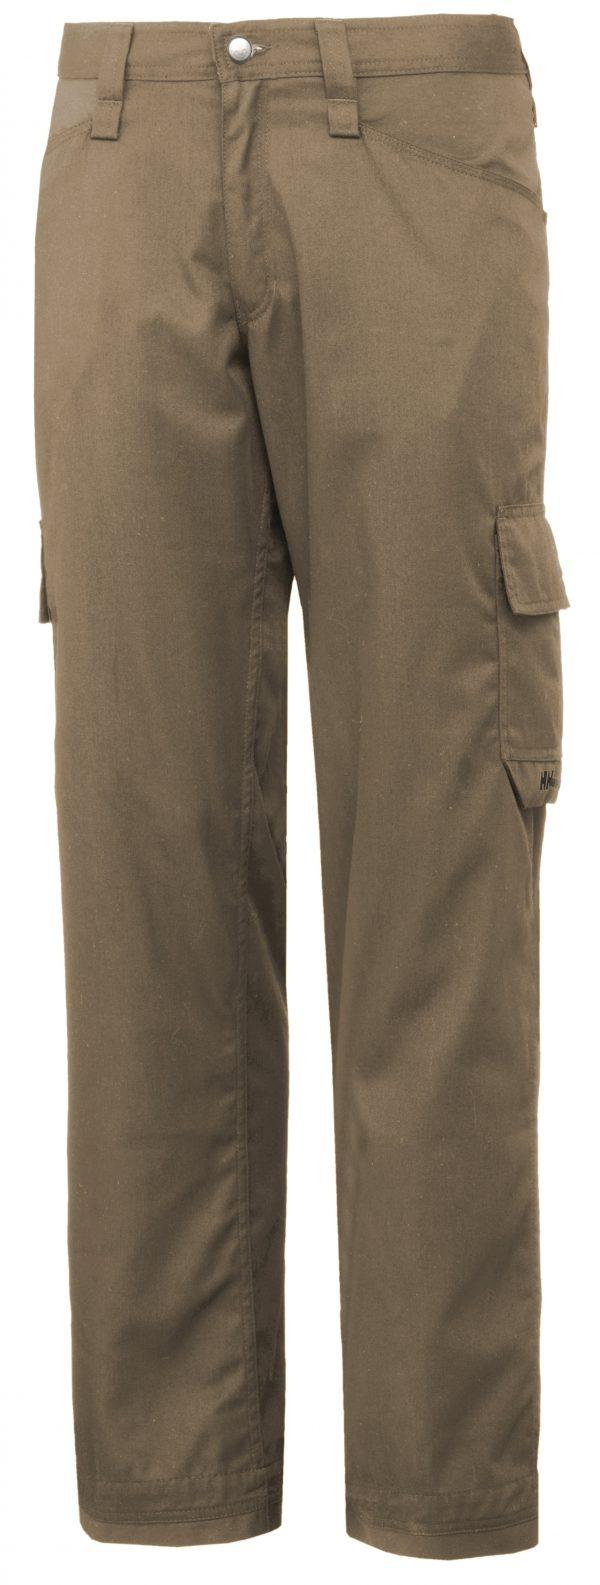 76591 Helly Hansen Workwear Men's Durham Service Pant, Khaki, Front